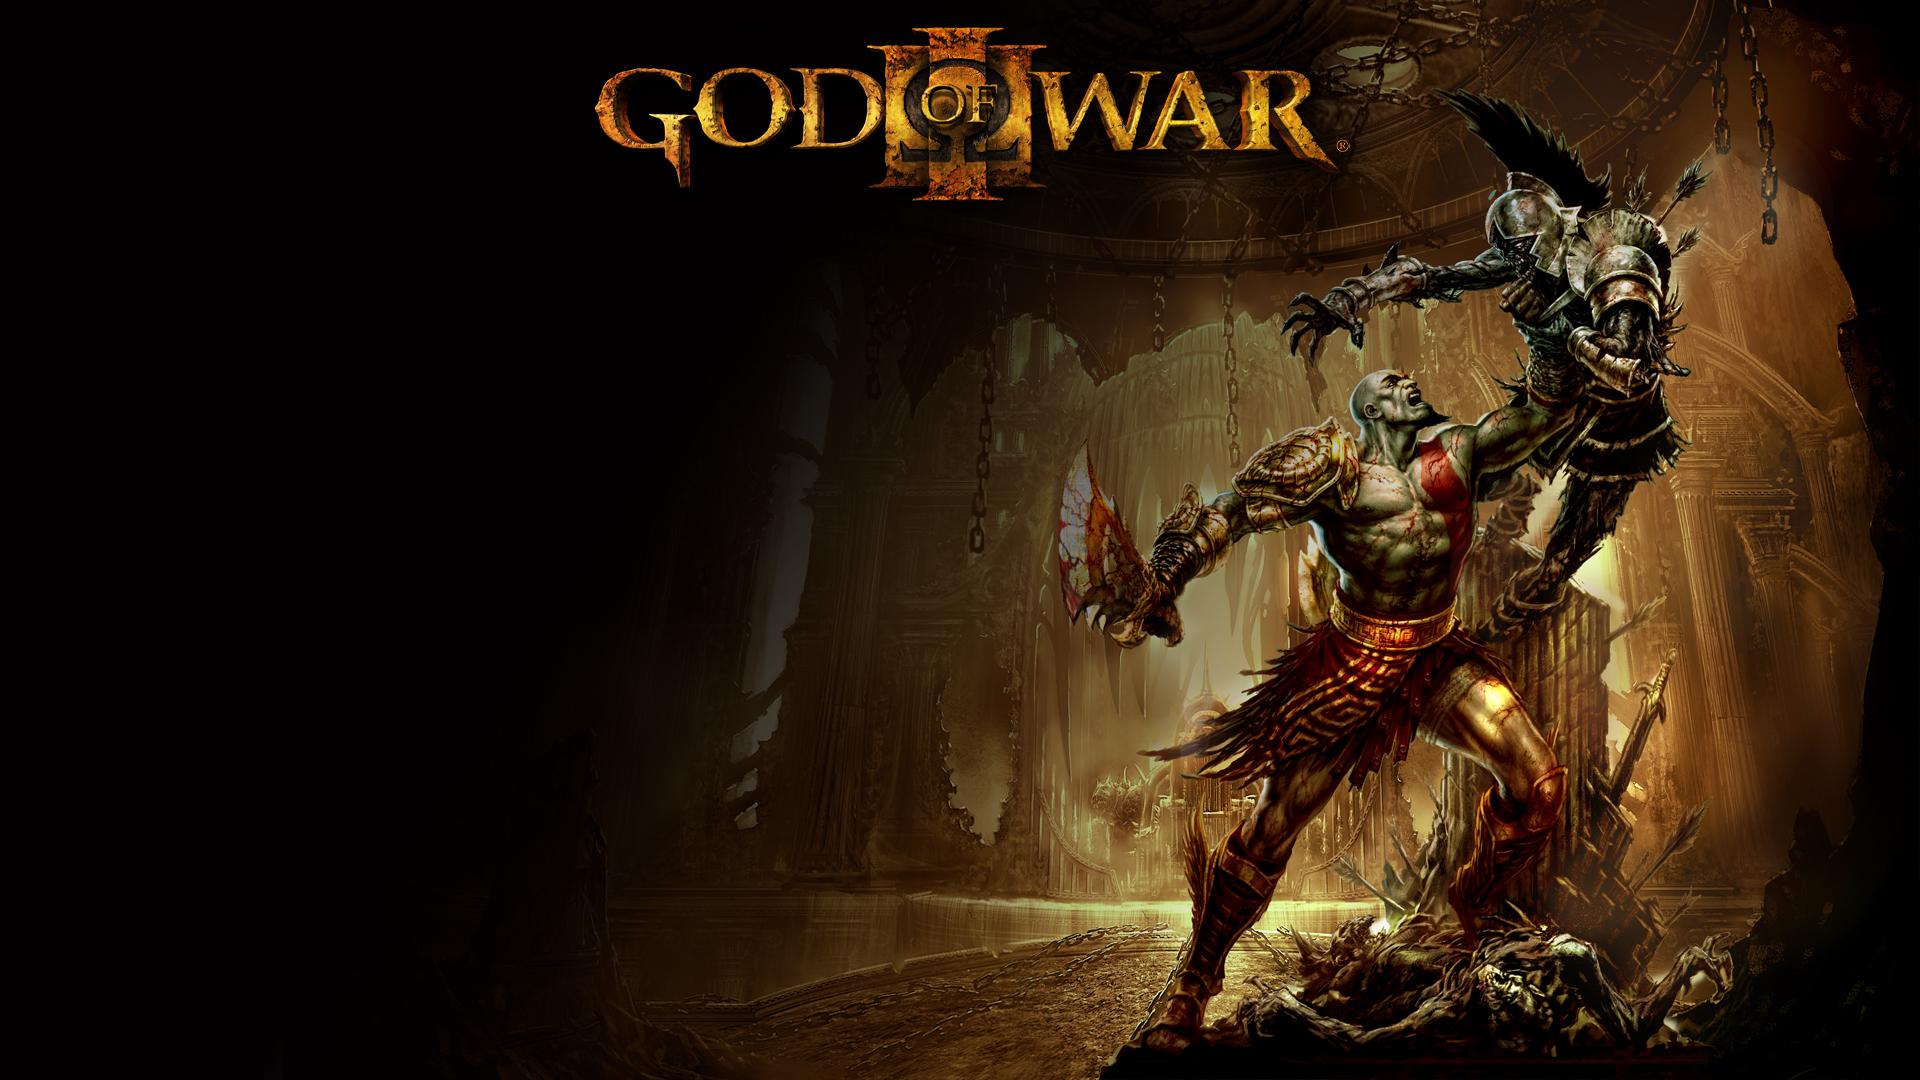 Download God Of War 3 Wallpaper Hd Wallpaper 1920x1080